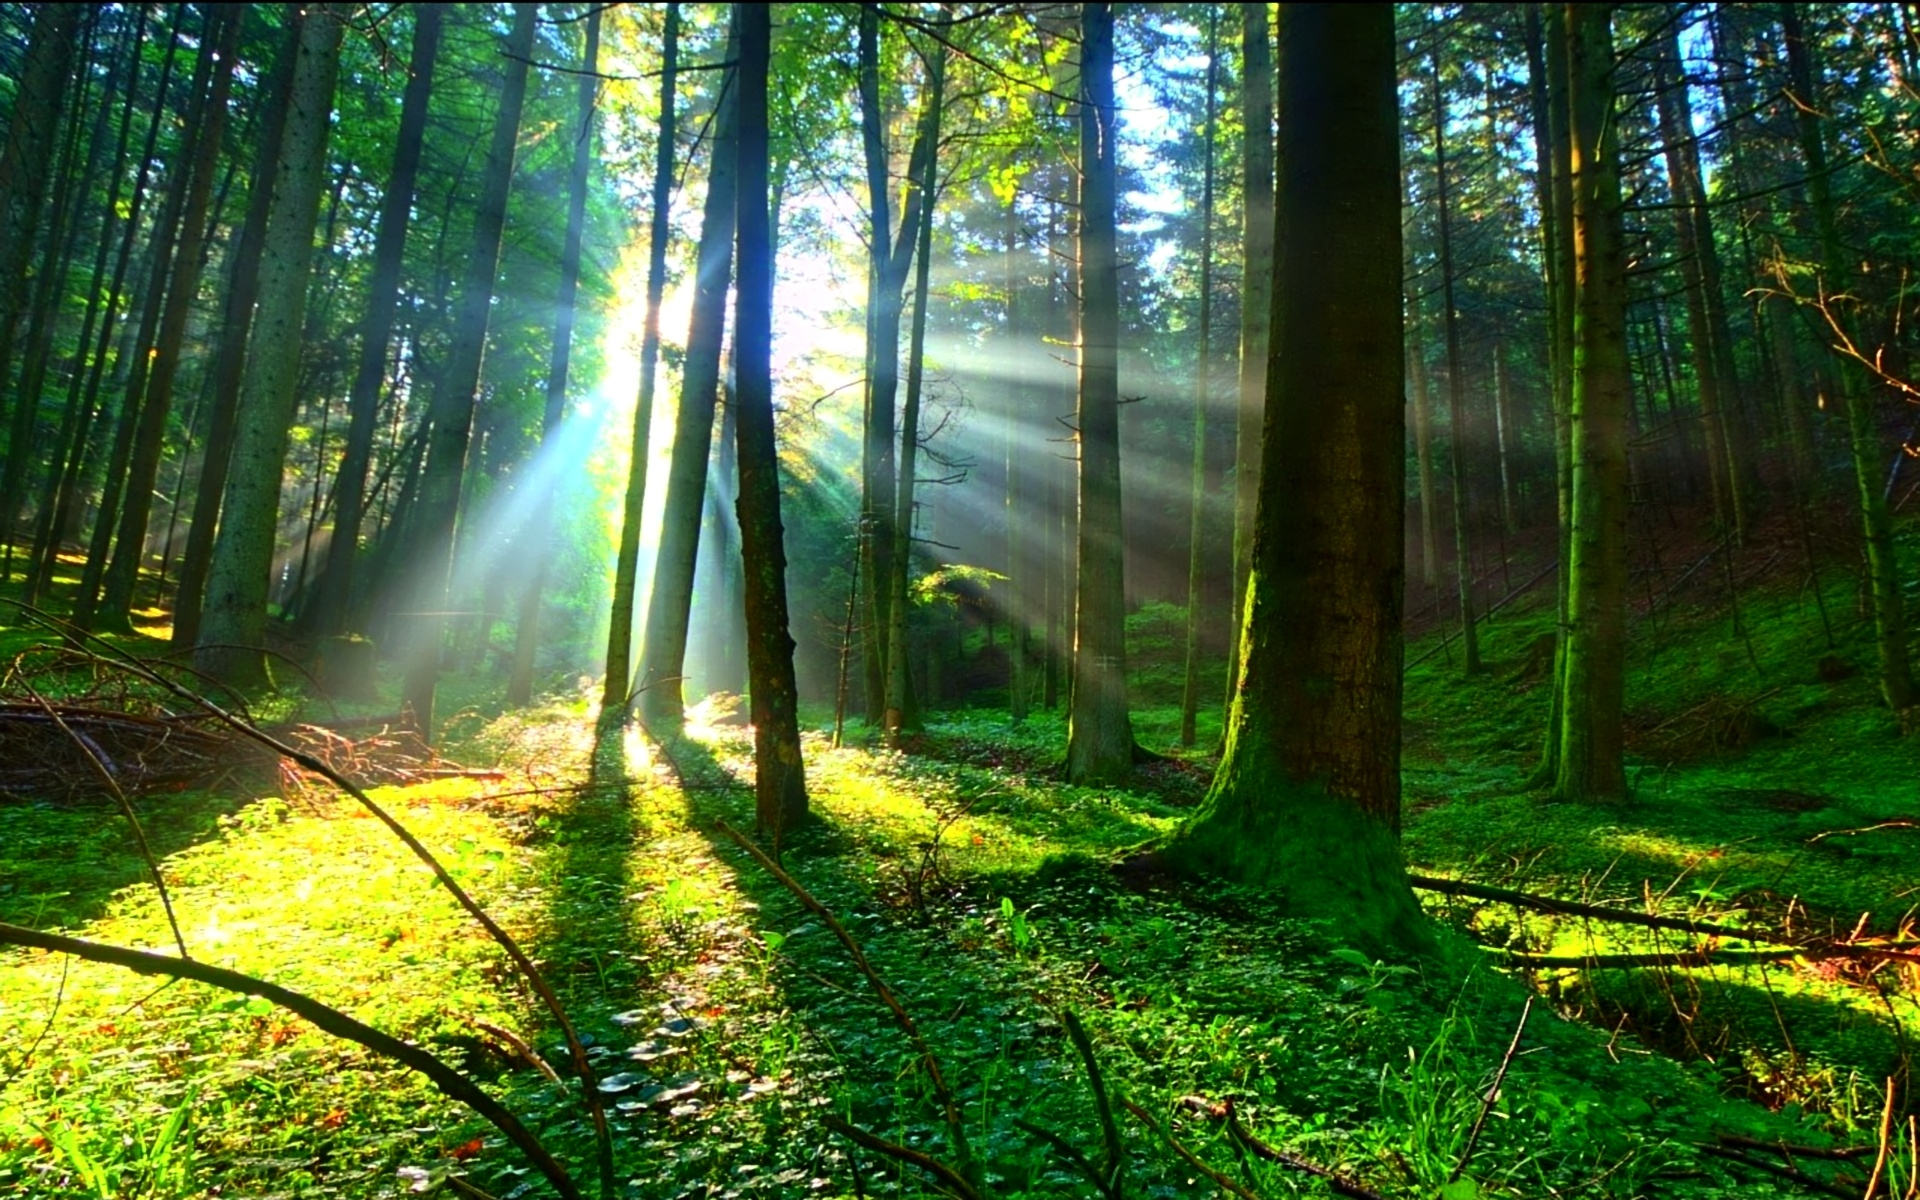 Fantasy Forest 3d Desktop Wallpaper Sunlight Wallpaper 1920x1200 43247